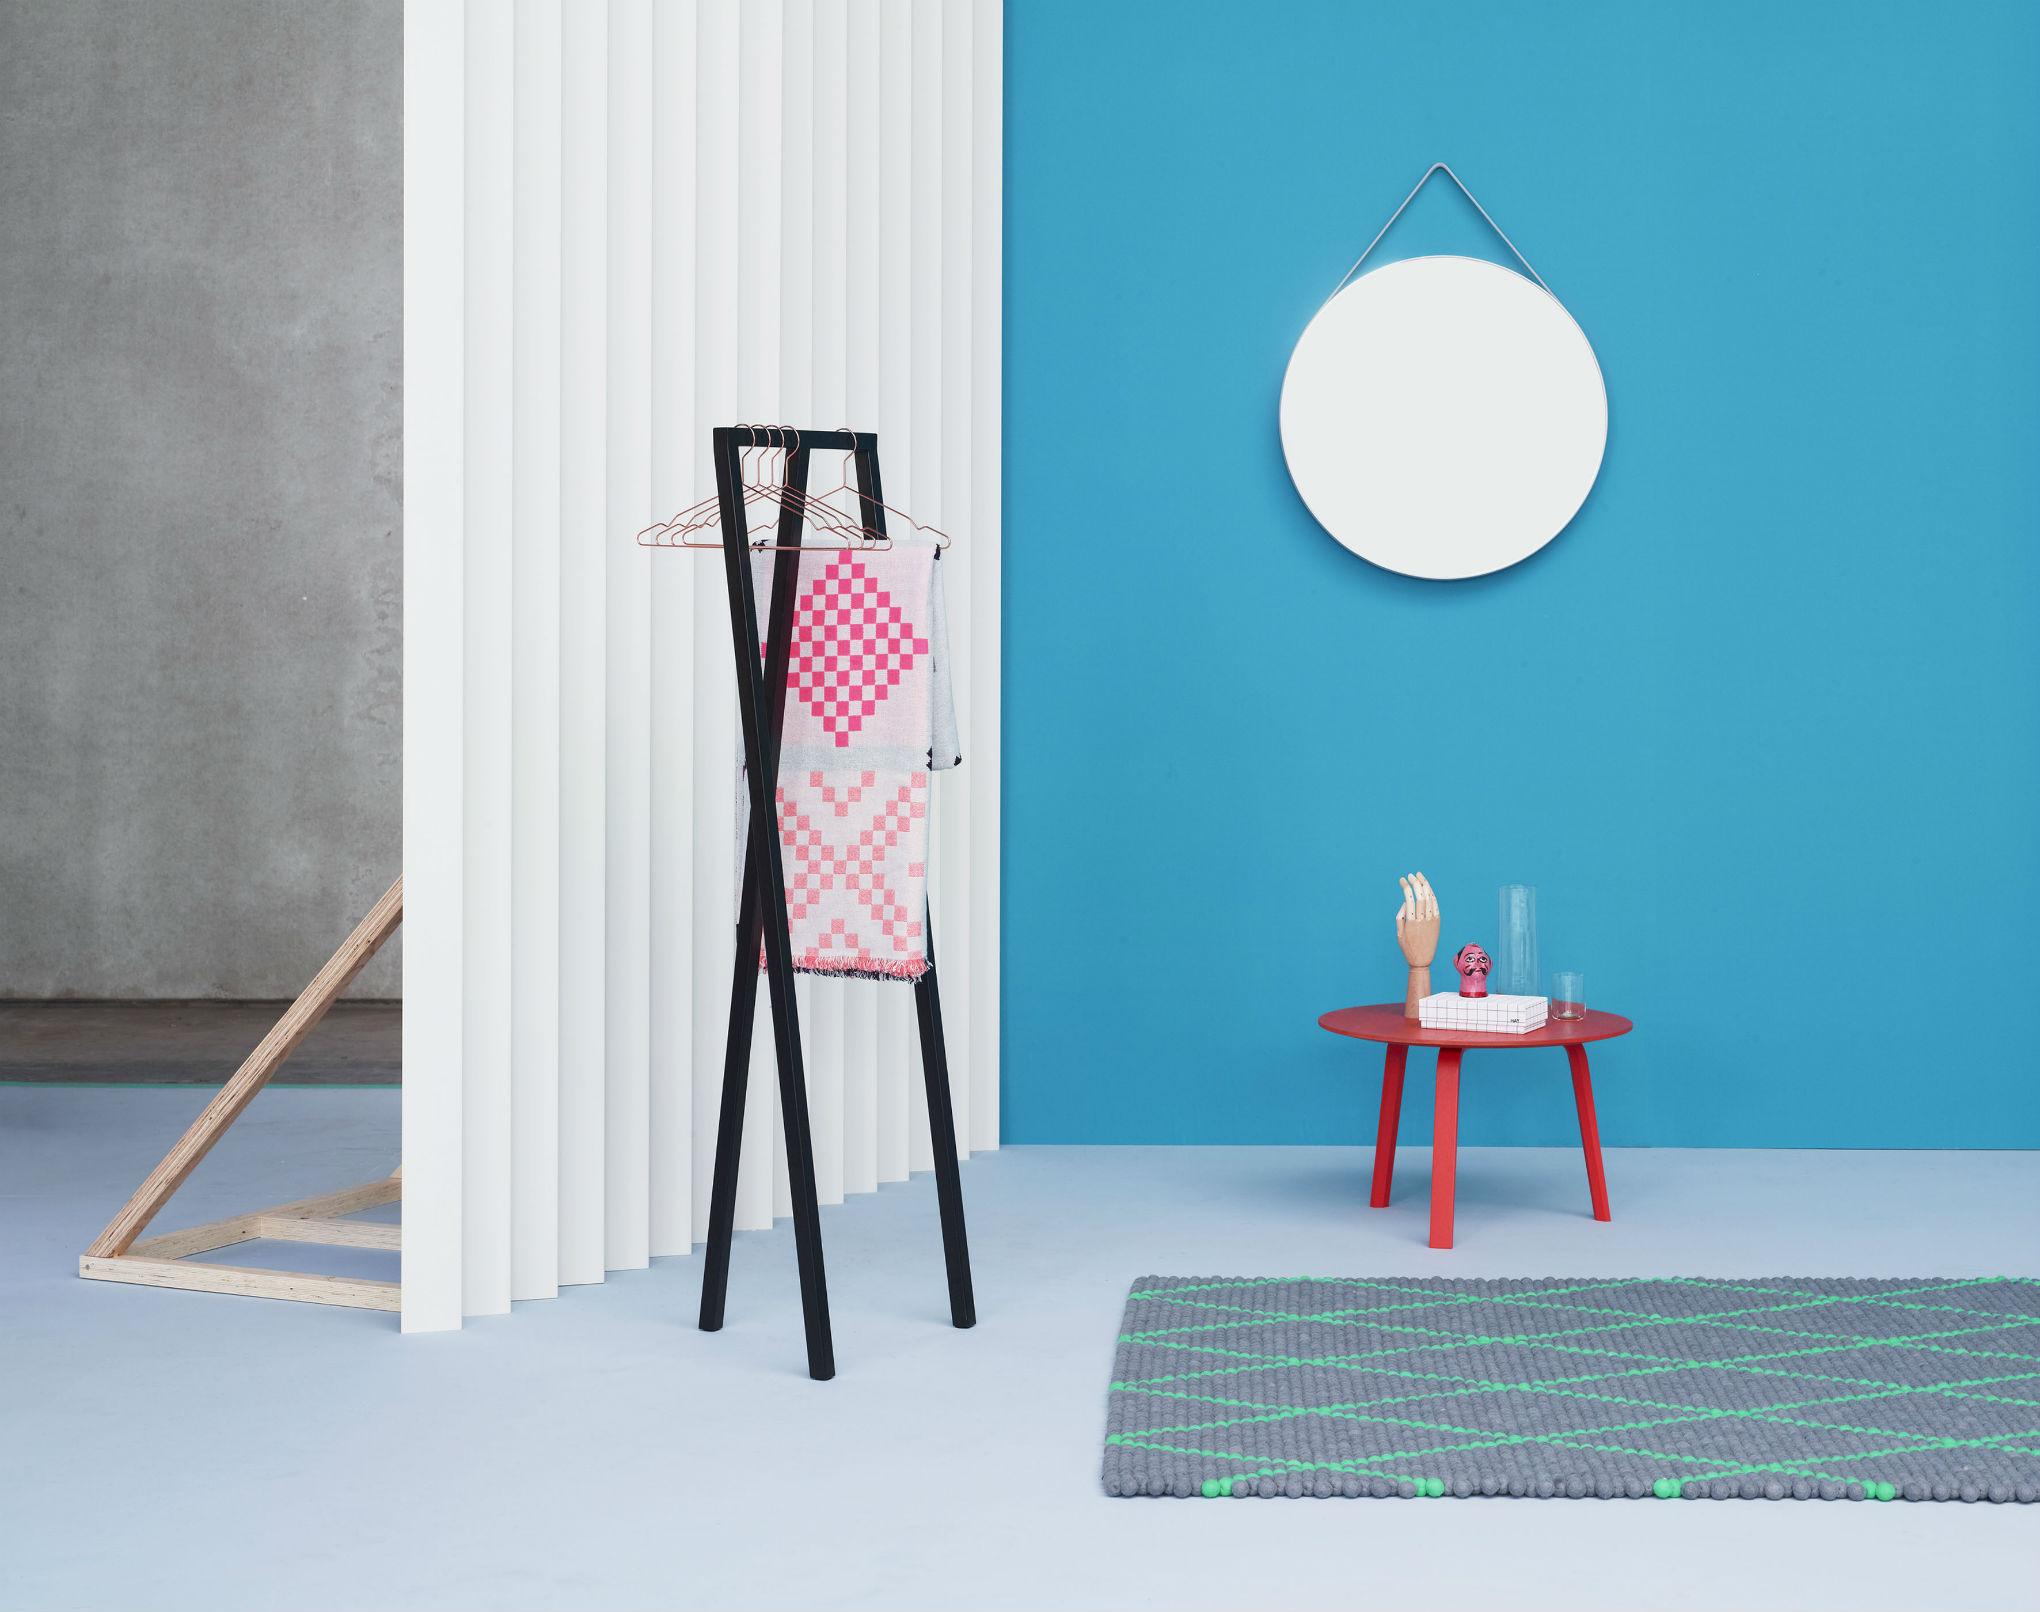 Loop Stand Mega Knit Strap Mirror Bella Cofee Table S&B Dot Carpet